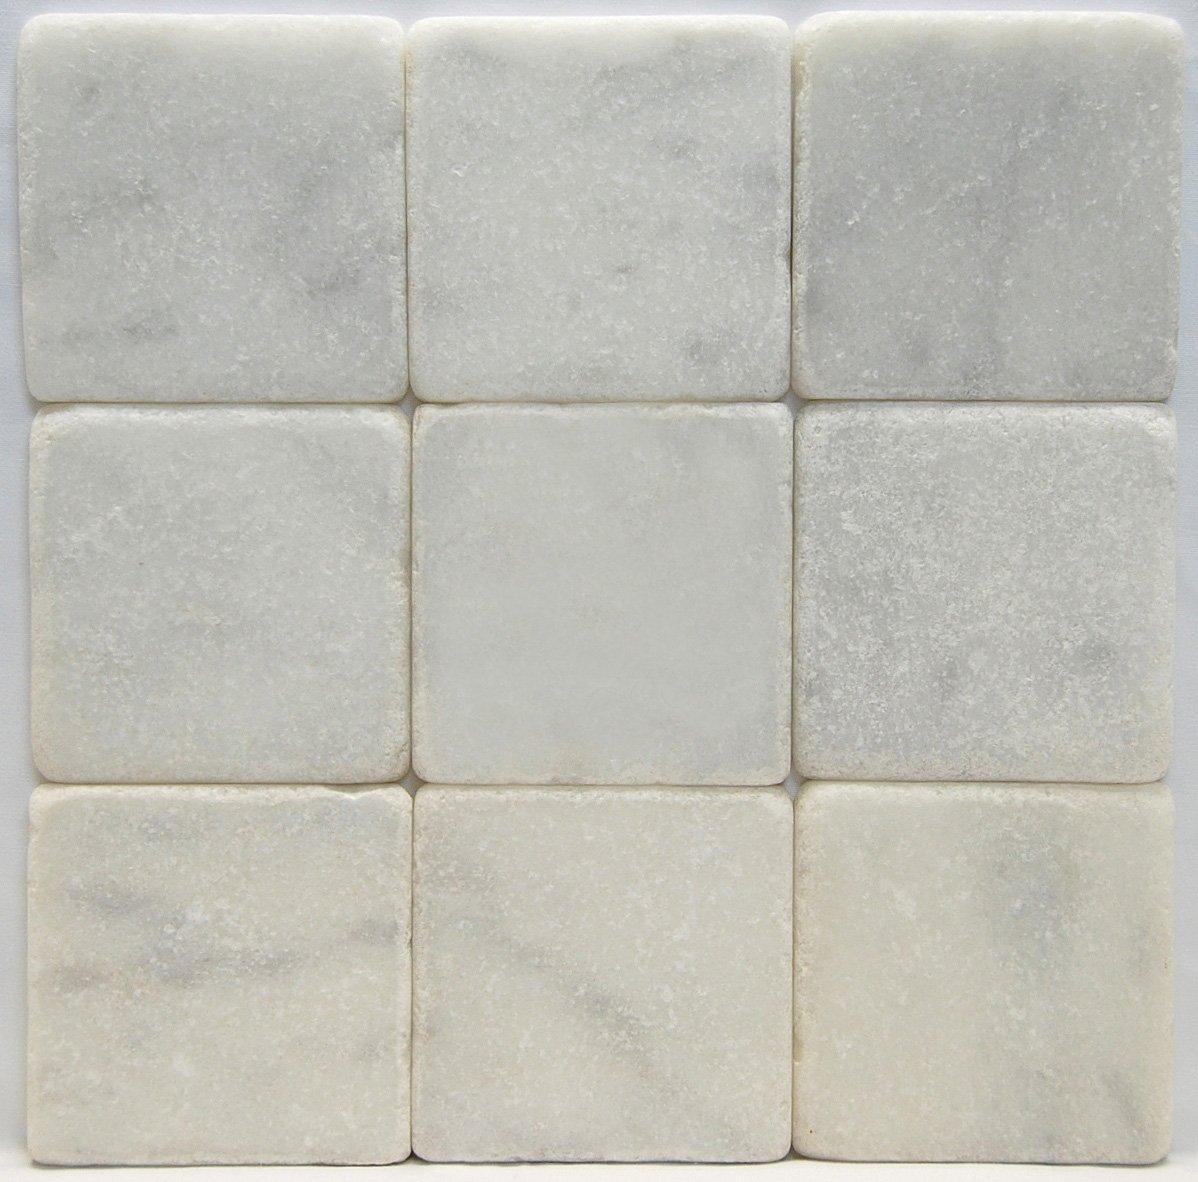 carrara marble italian white bianco carrera 4x4 marble tile tumbled amazoncom